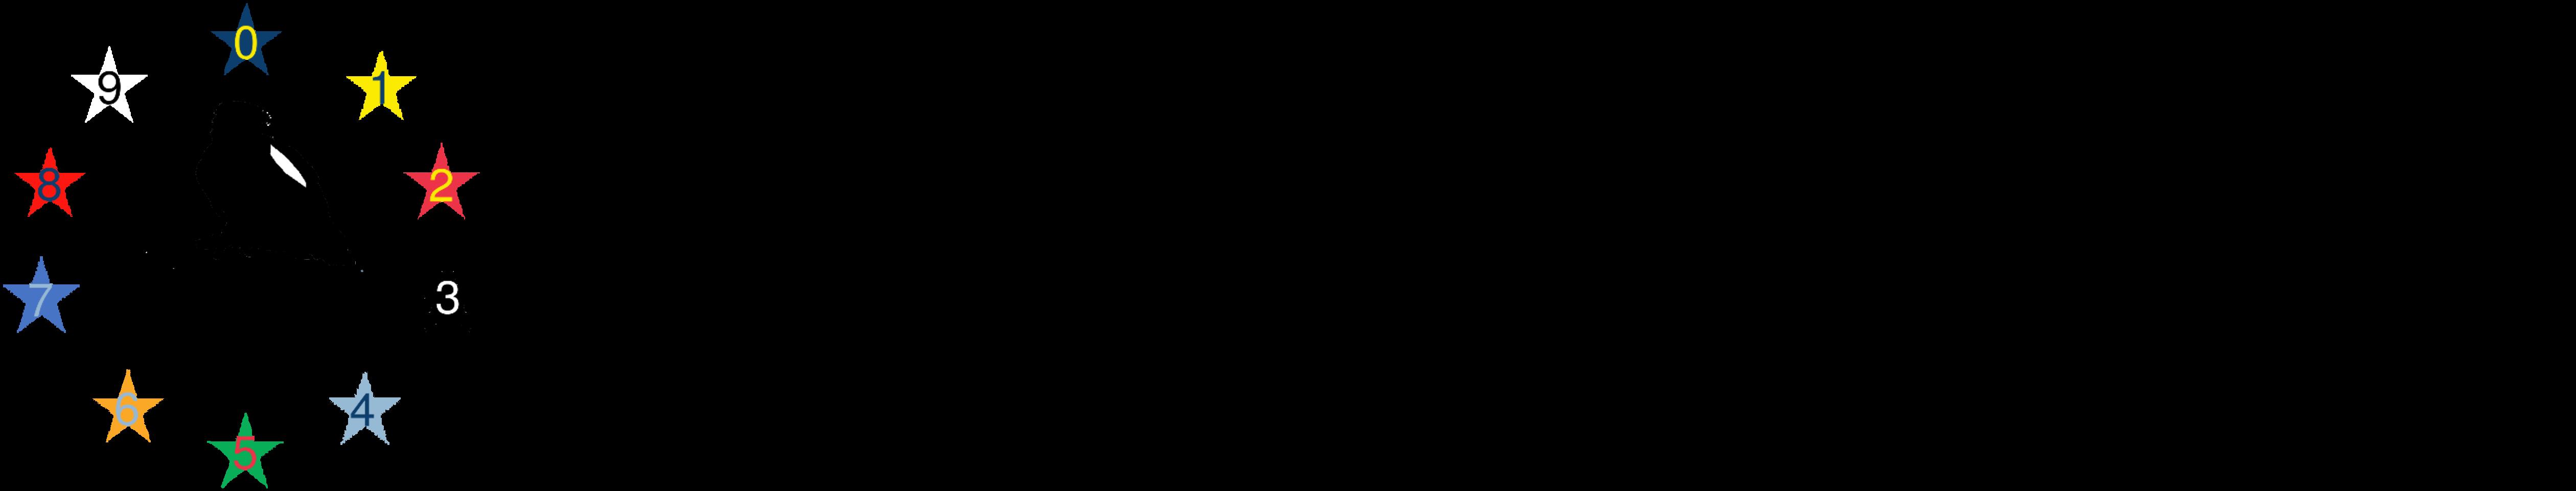 PDM.language.sql-®-6905.040000.380.01771740386-1913.0